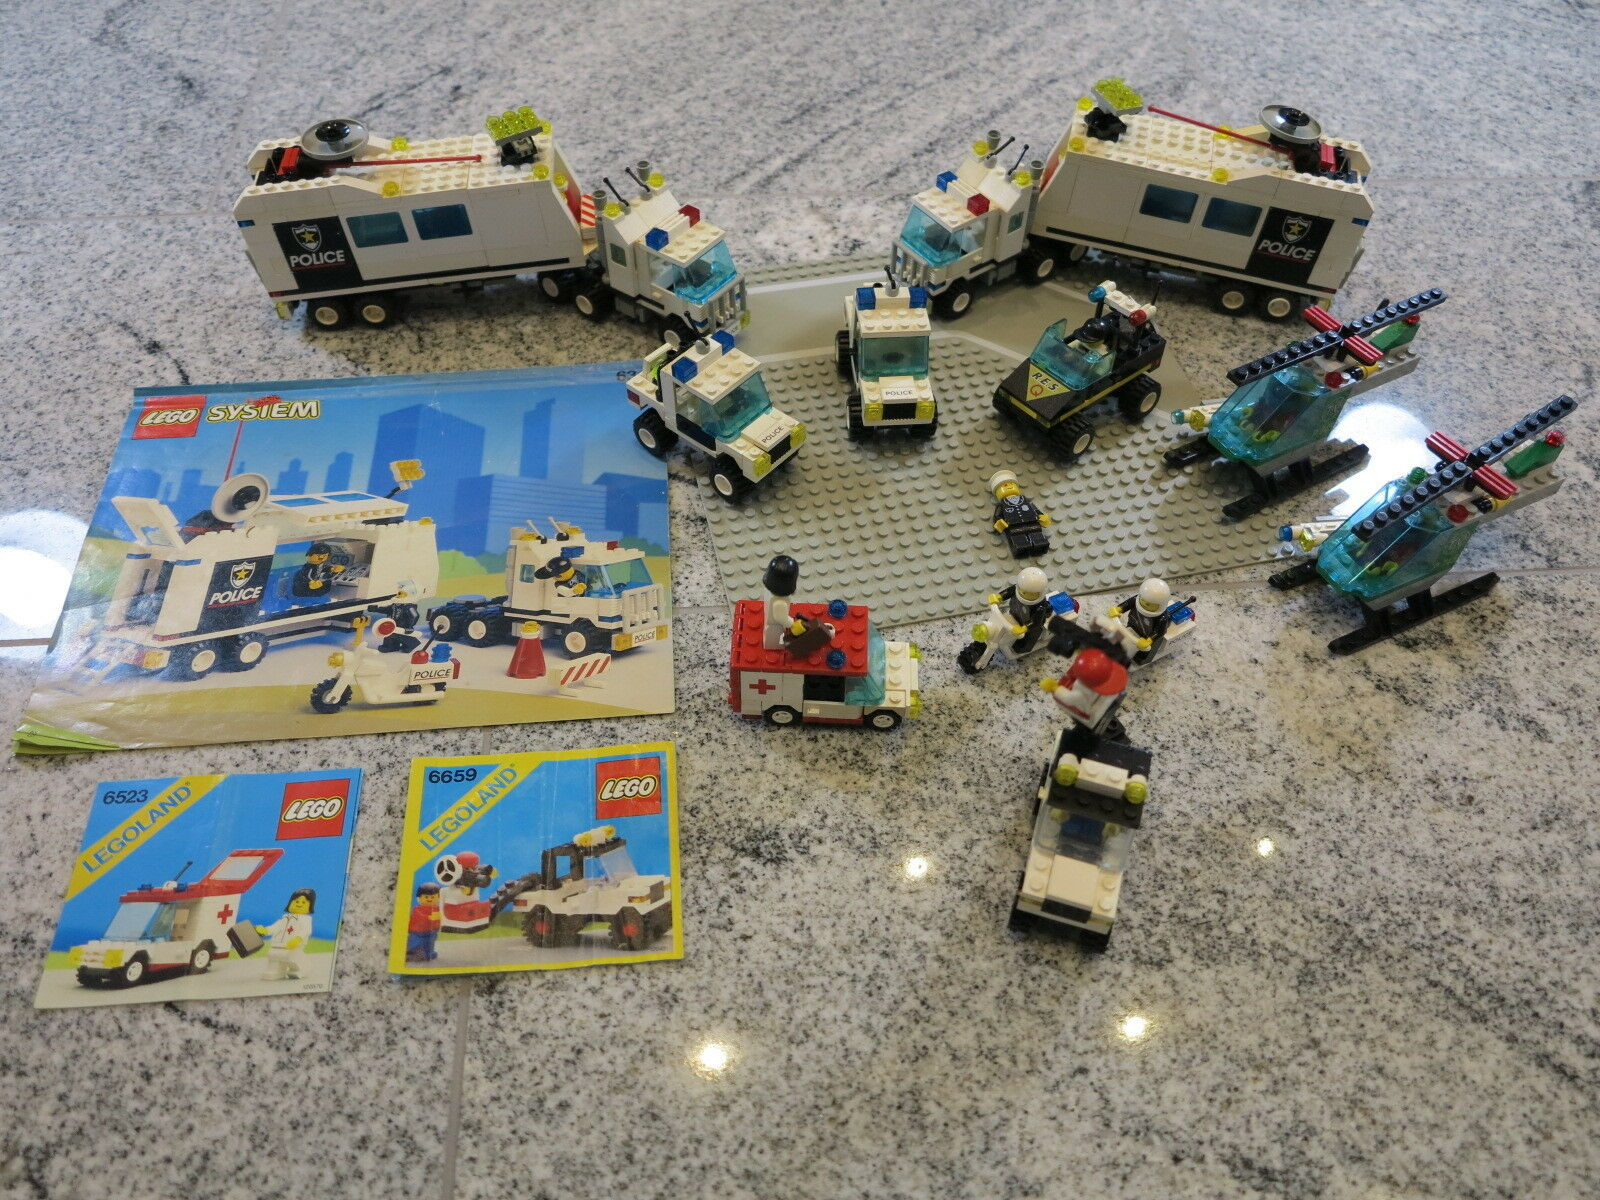 LEGO SYSTEM CITY 6348+6431+6425+6523+6659 Mobile Polizeieinsatzzentrale +OBA uvm